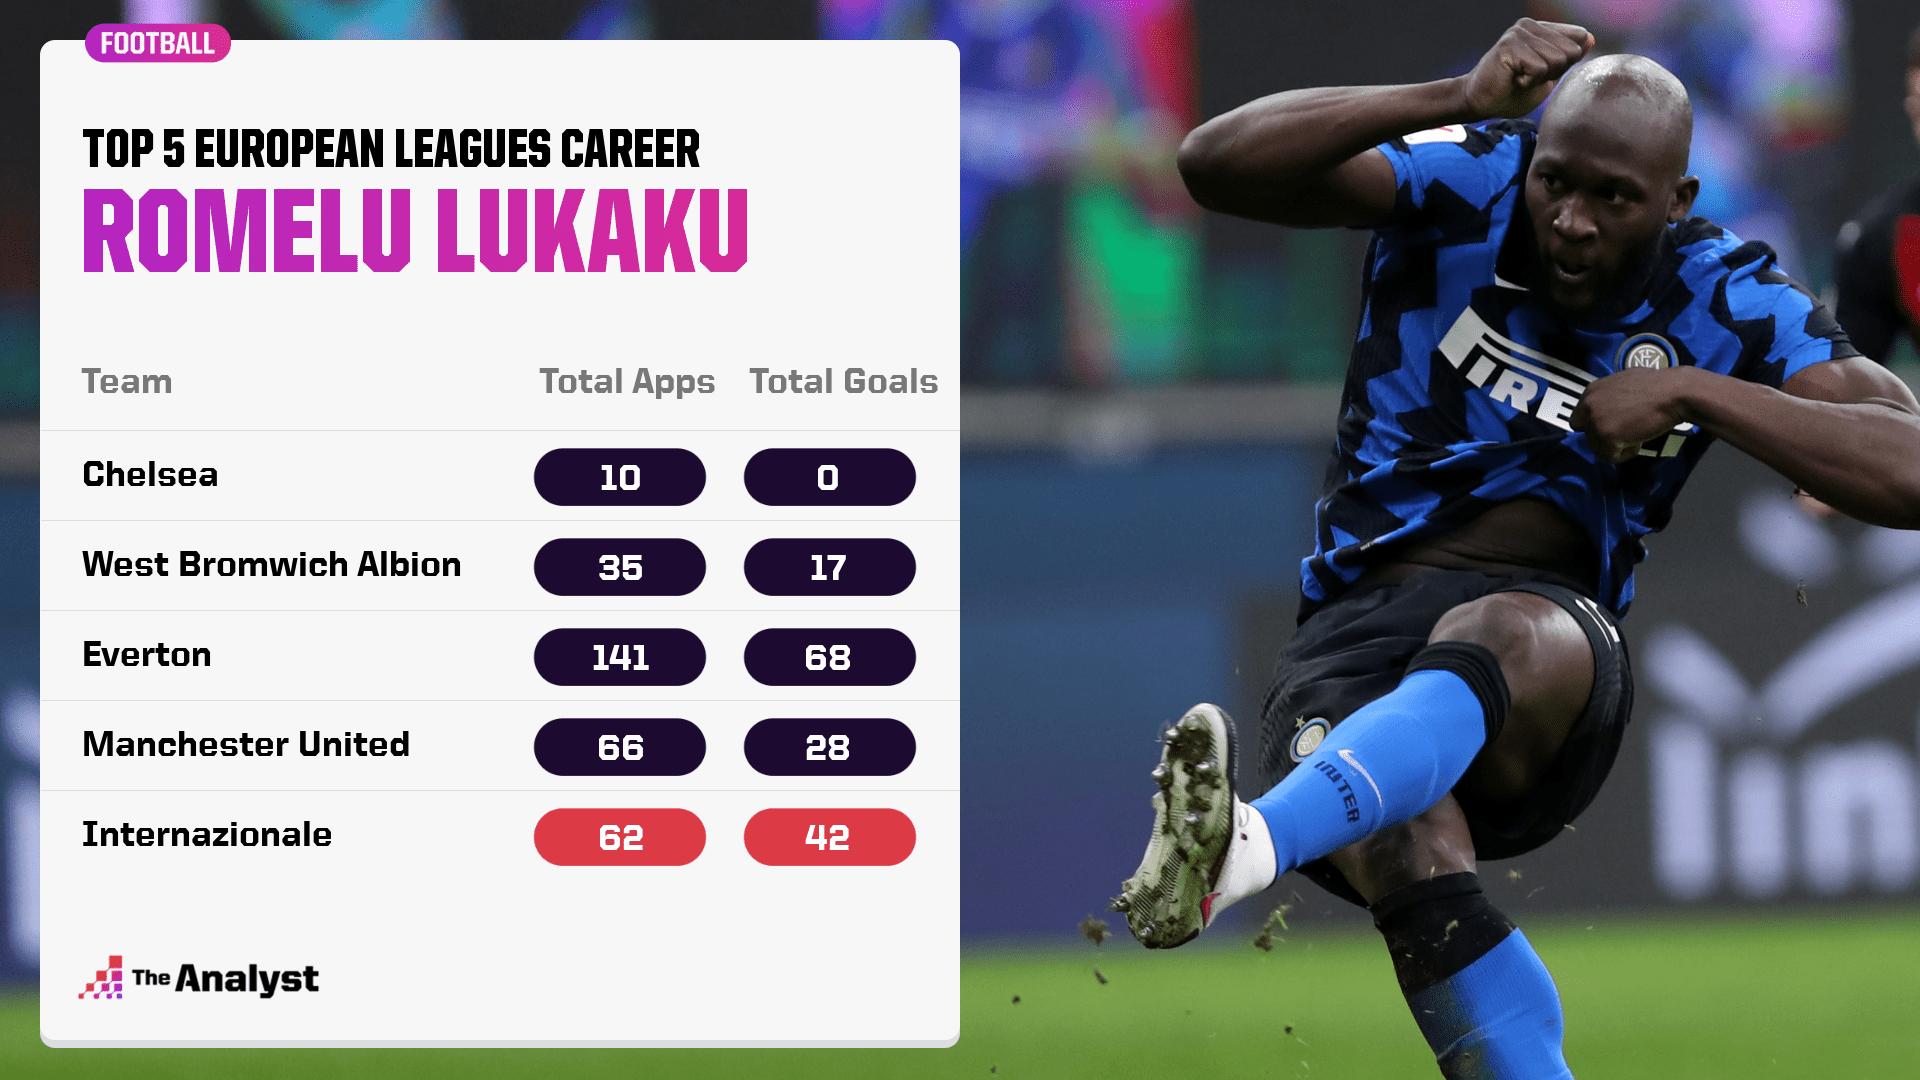 Romelu Lukaku Career Stats Across Top Five European Leagues